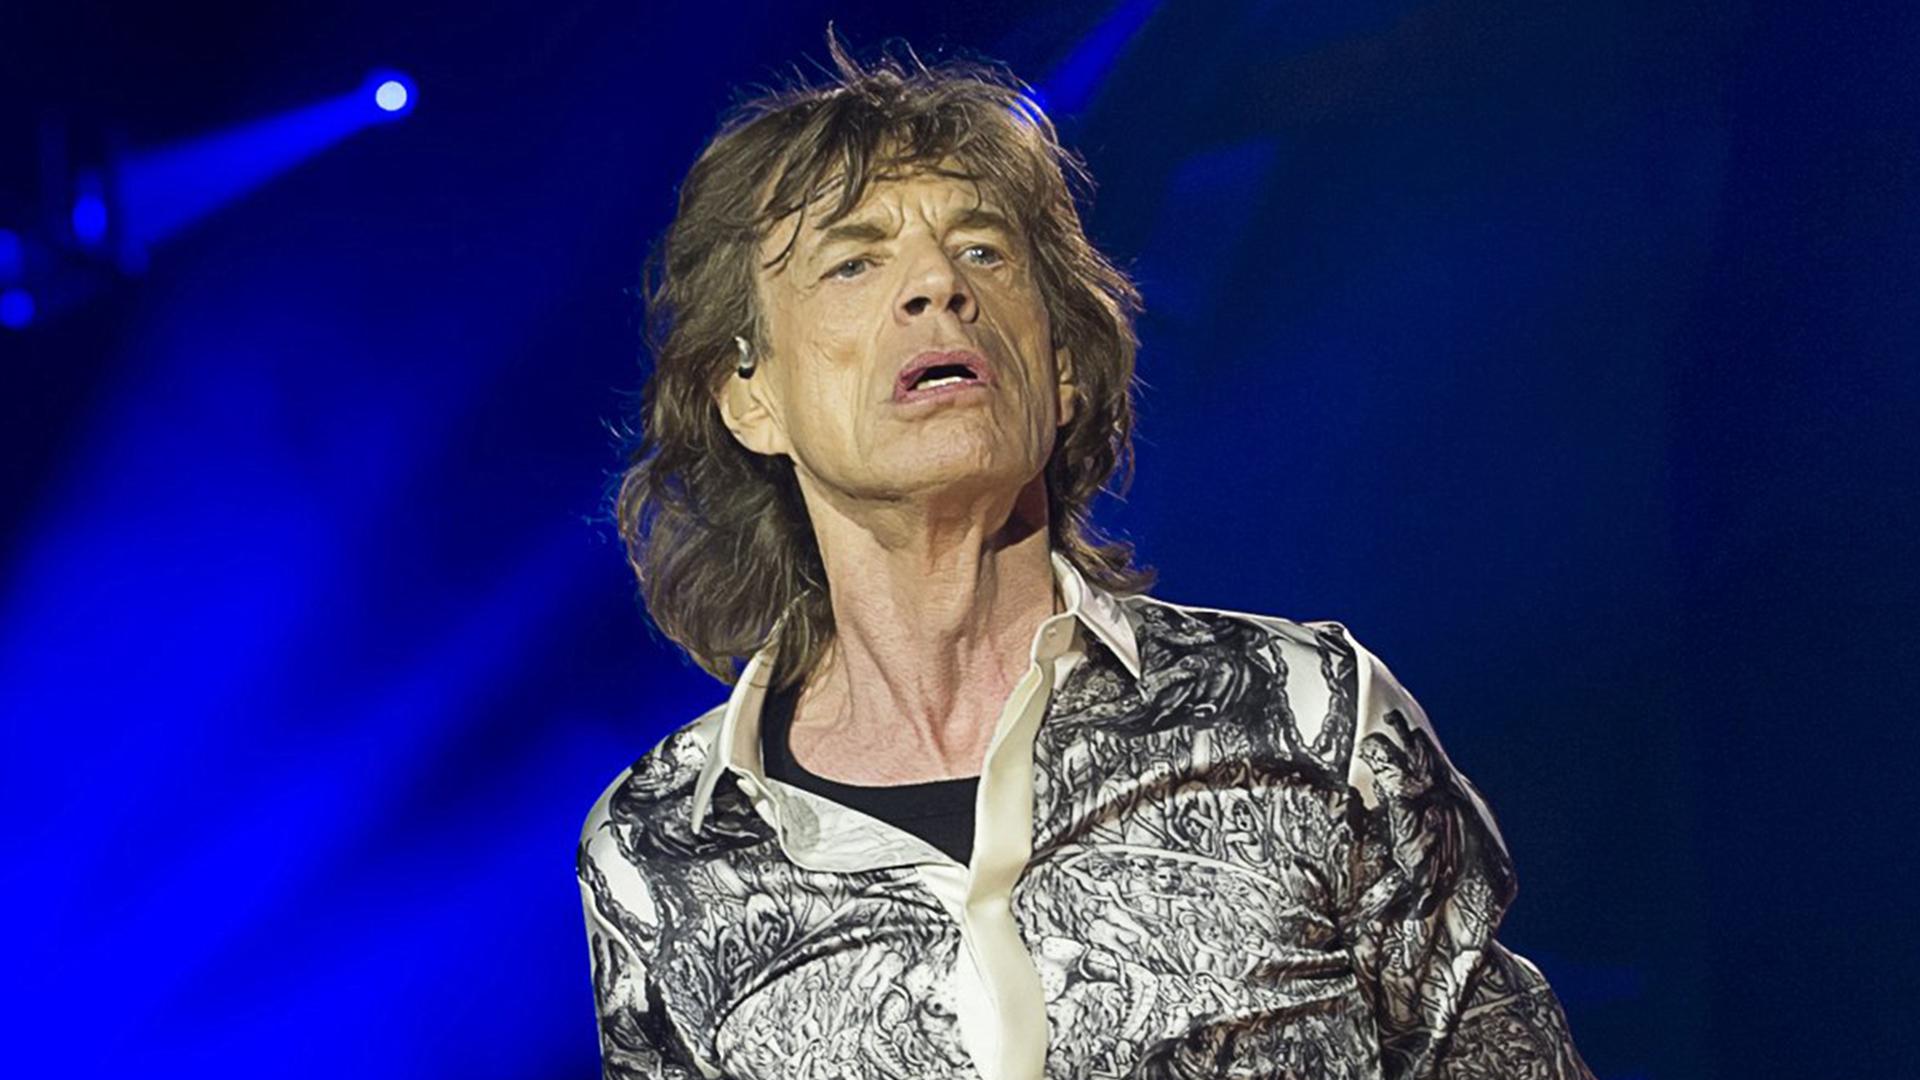 rolling stones resume tour after l u2019wren scott suicide